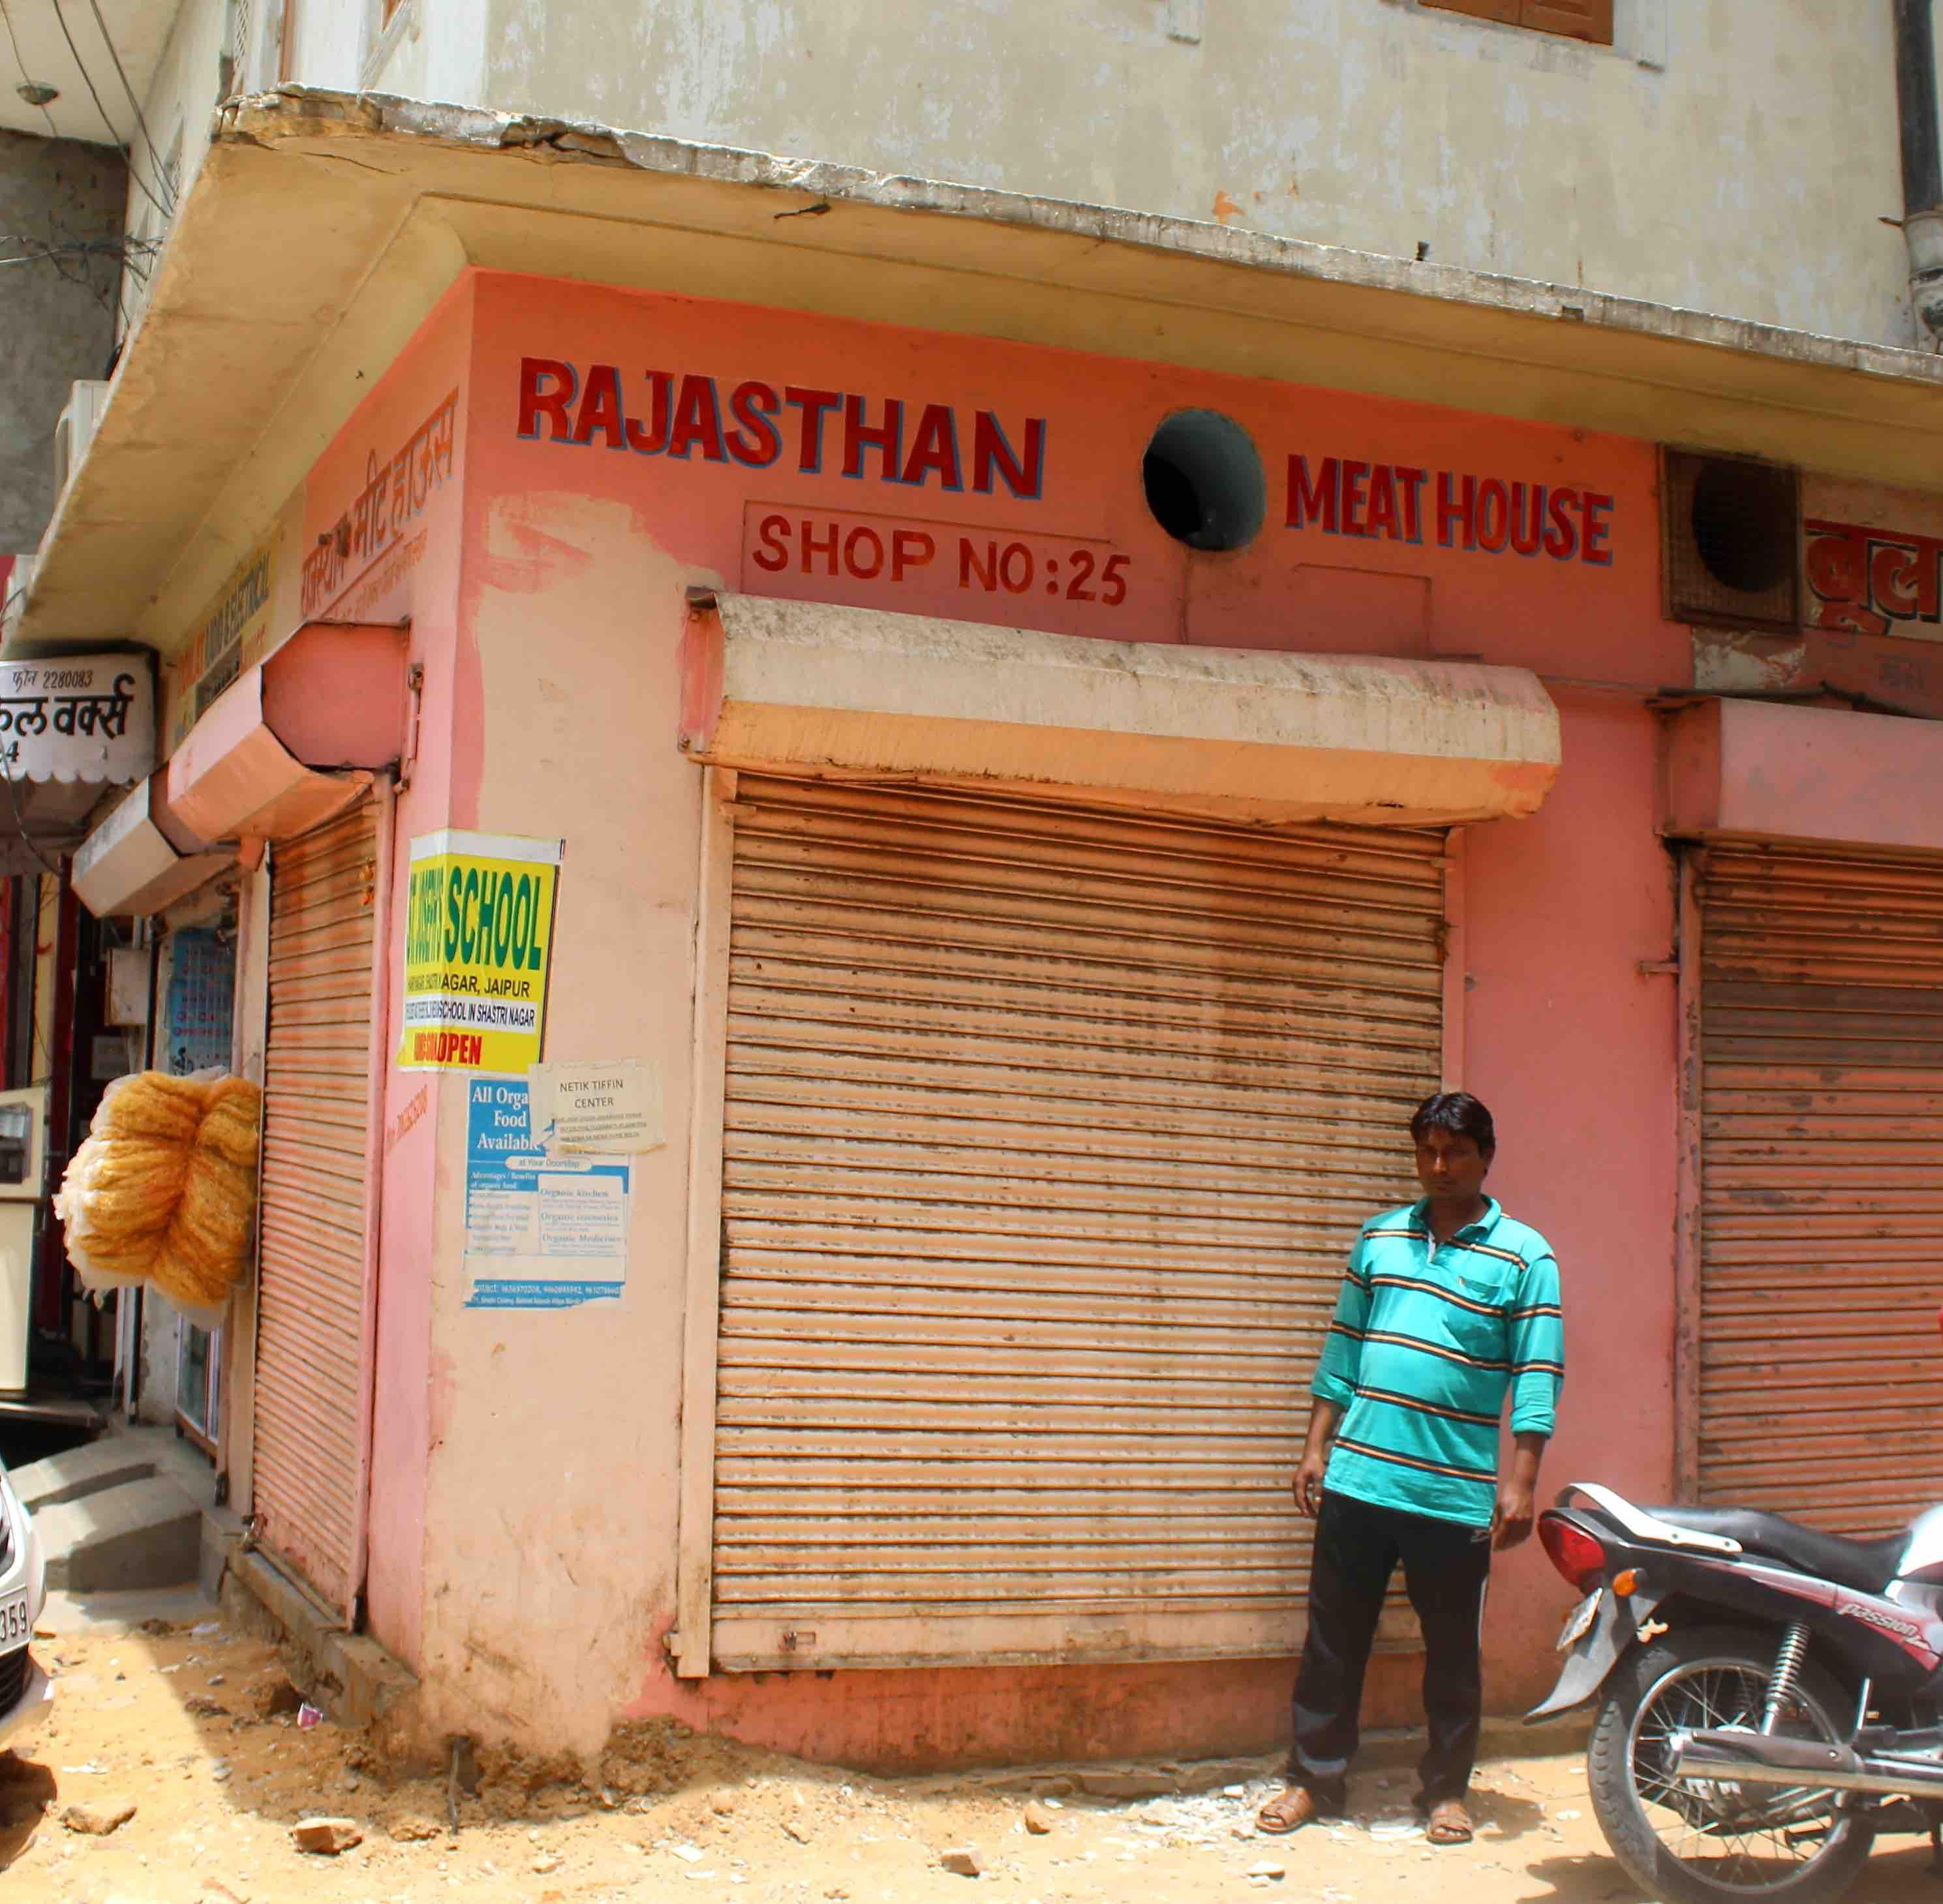 Riyazuddin Qureshi outside his sealed meat shop in Sindhi colony. Credit: Shruti Jain